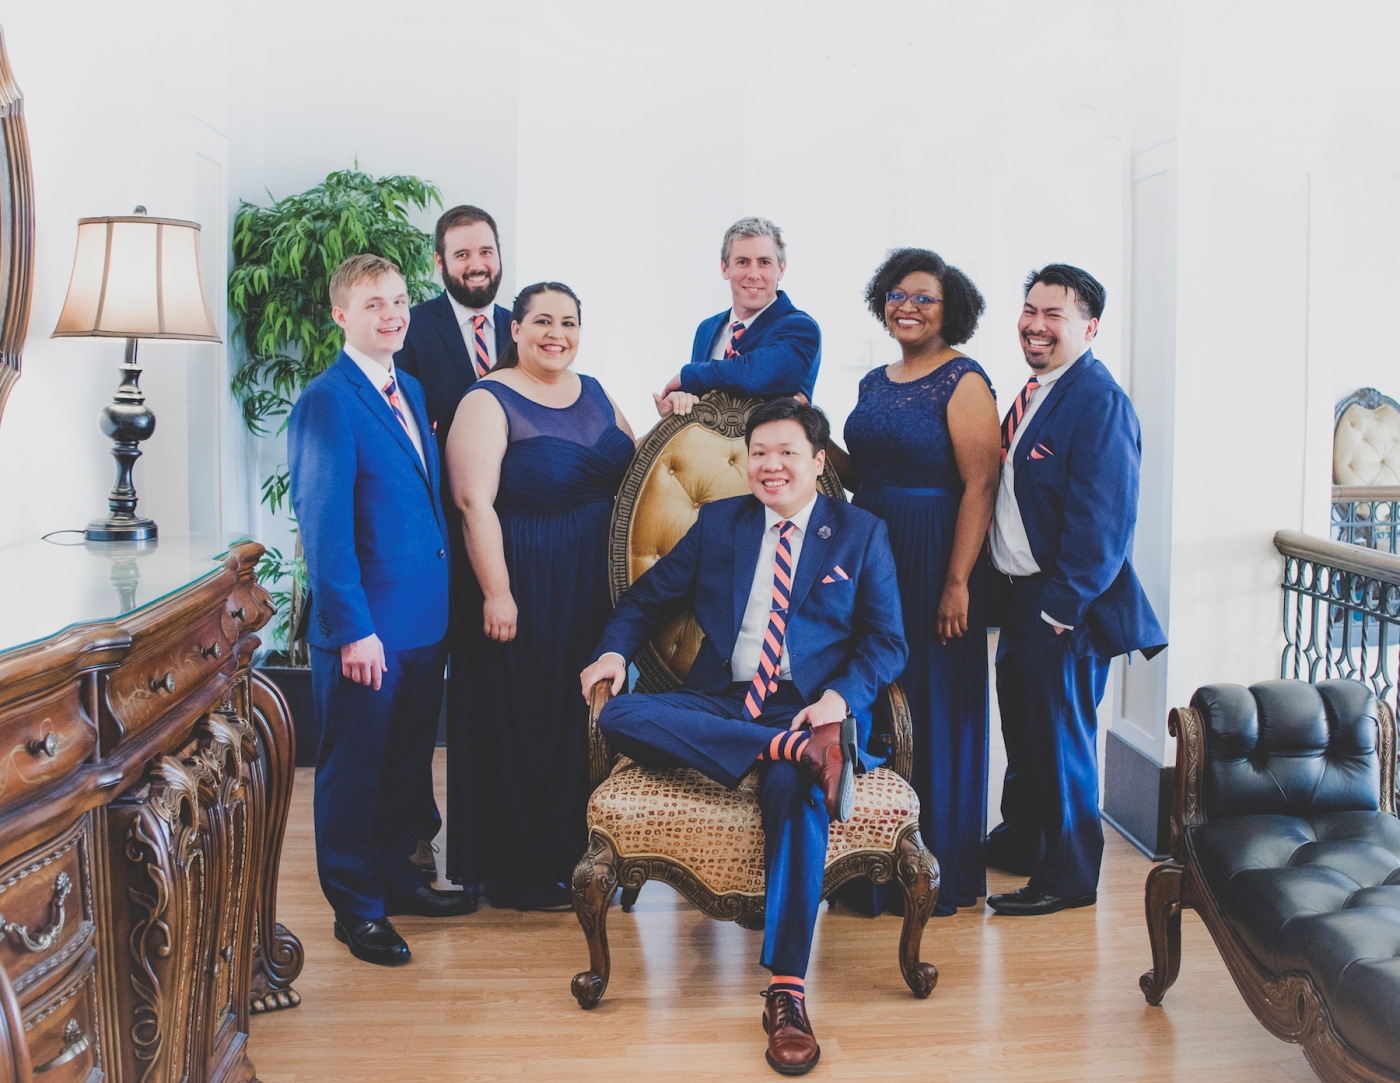 DSC_1963Everett_Wedding_Ballroom_Jane_Speleers_photography_Rachel_and_Edmund_Getting_ready_2017